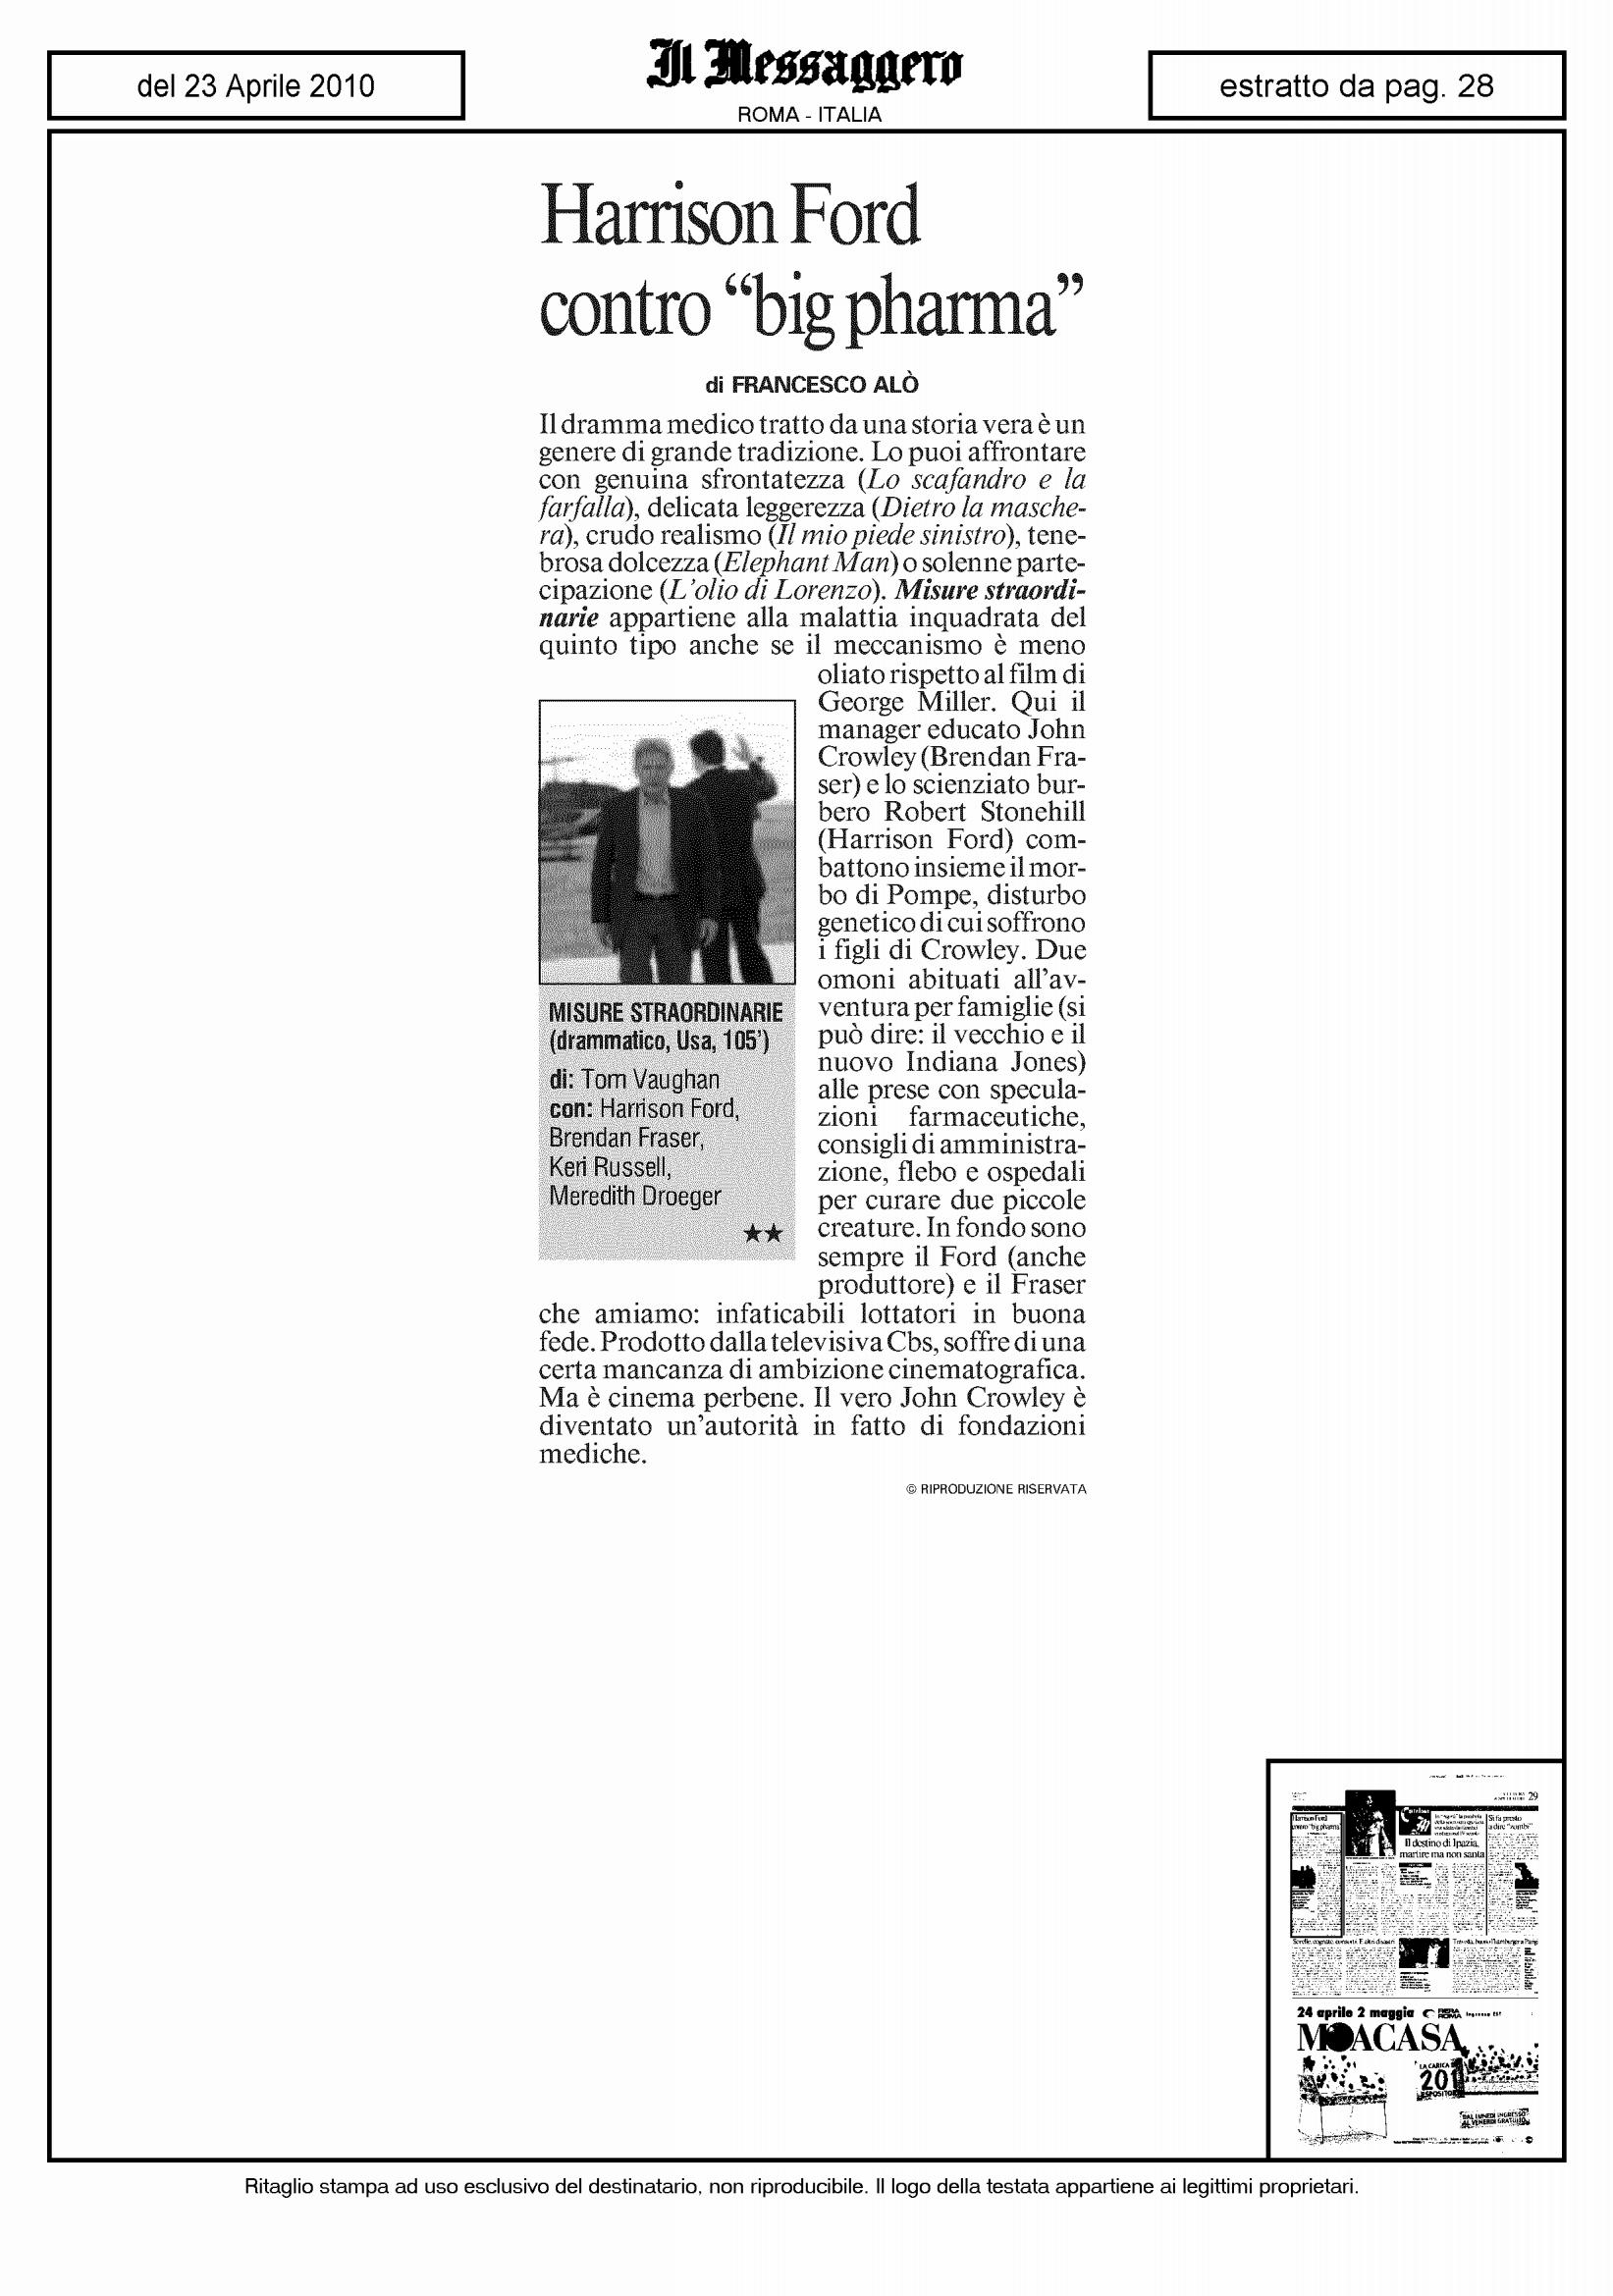 Stampa_20100422_misure straordinarie_Page_5